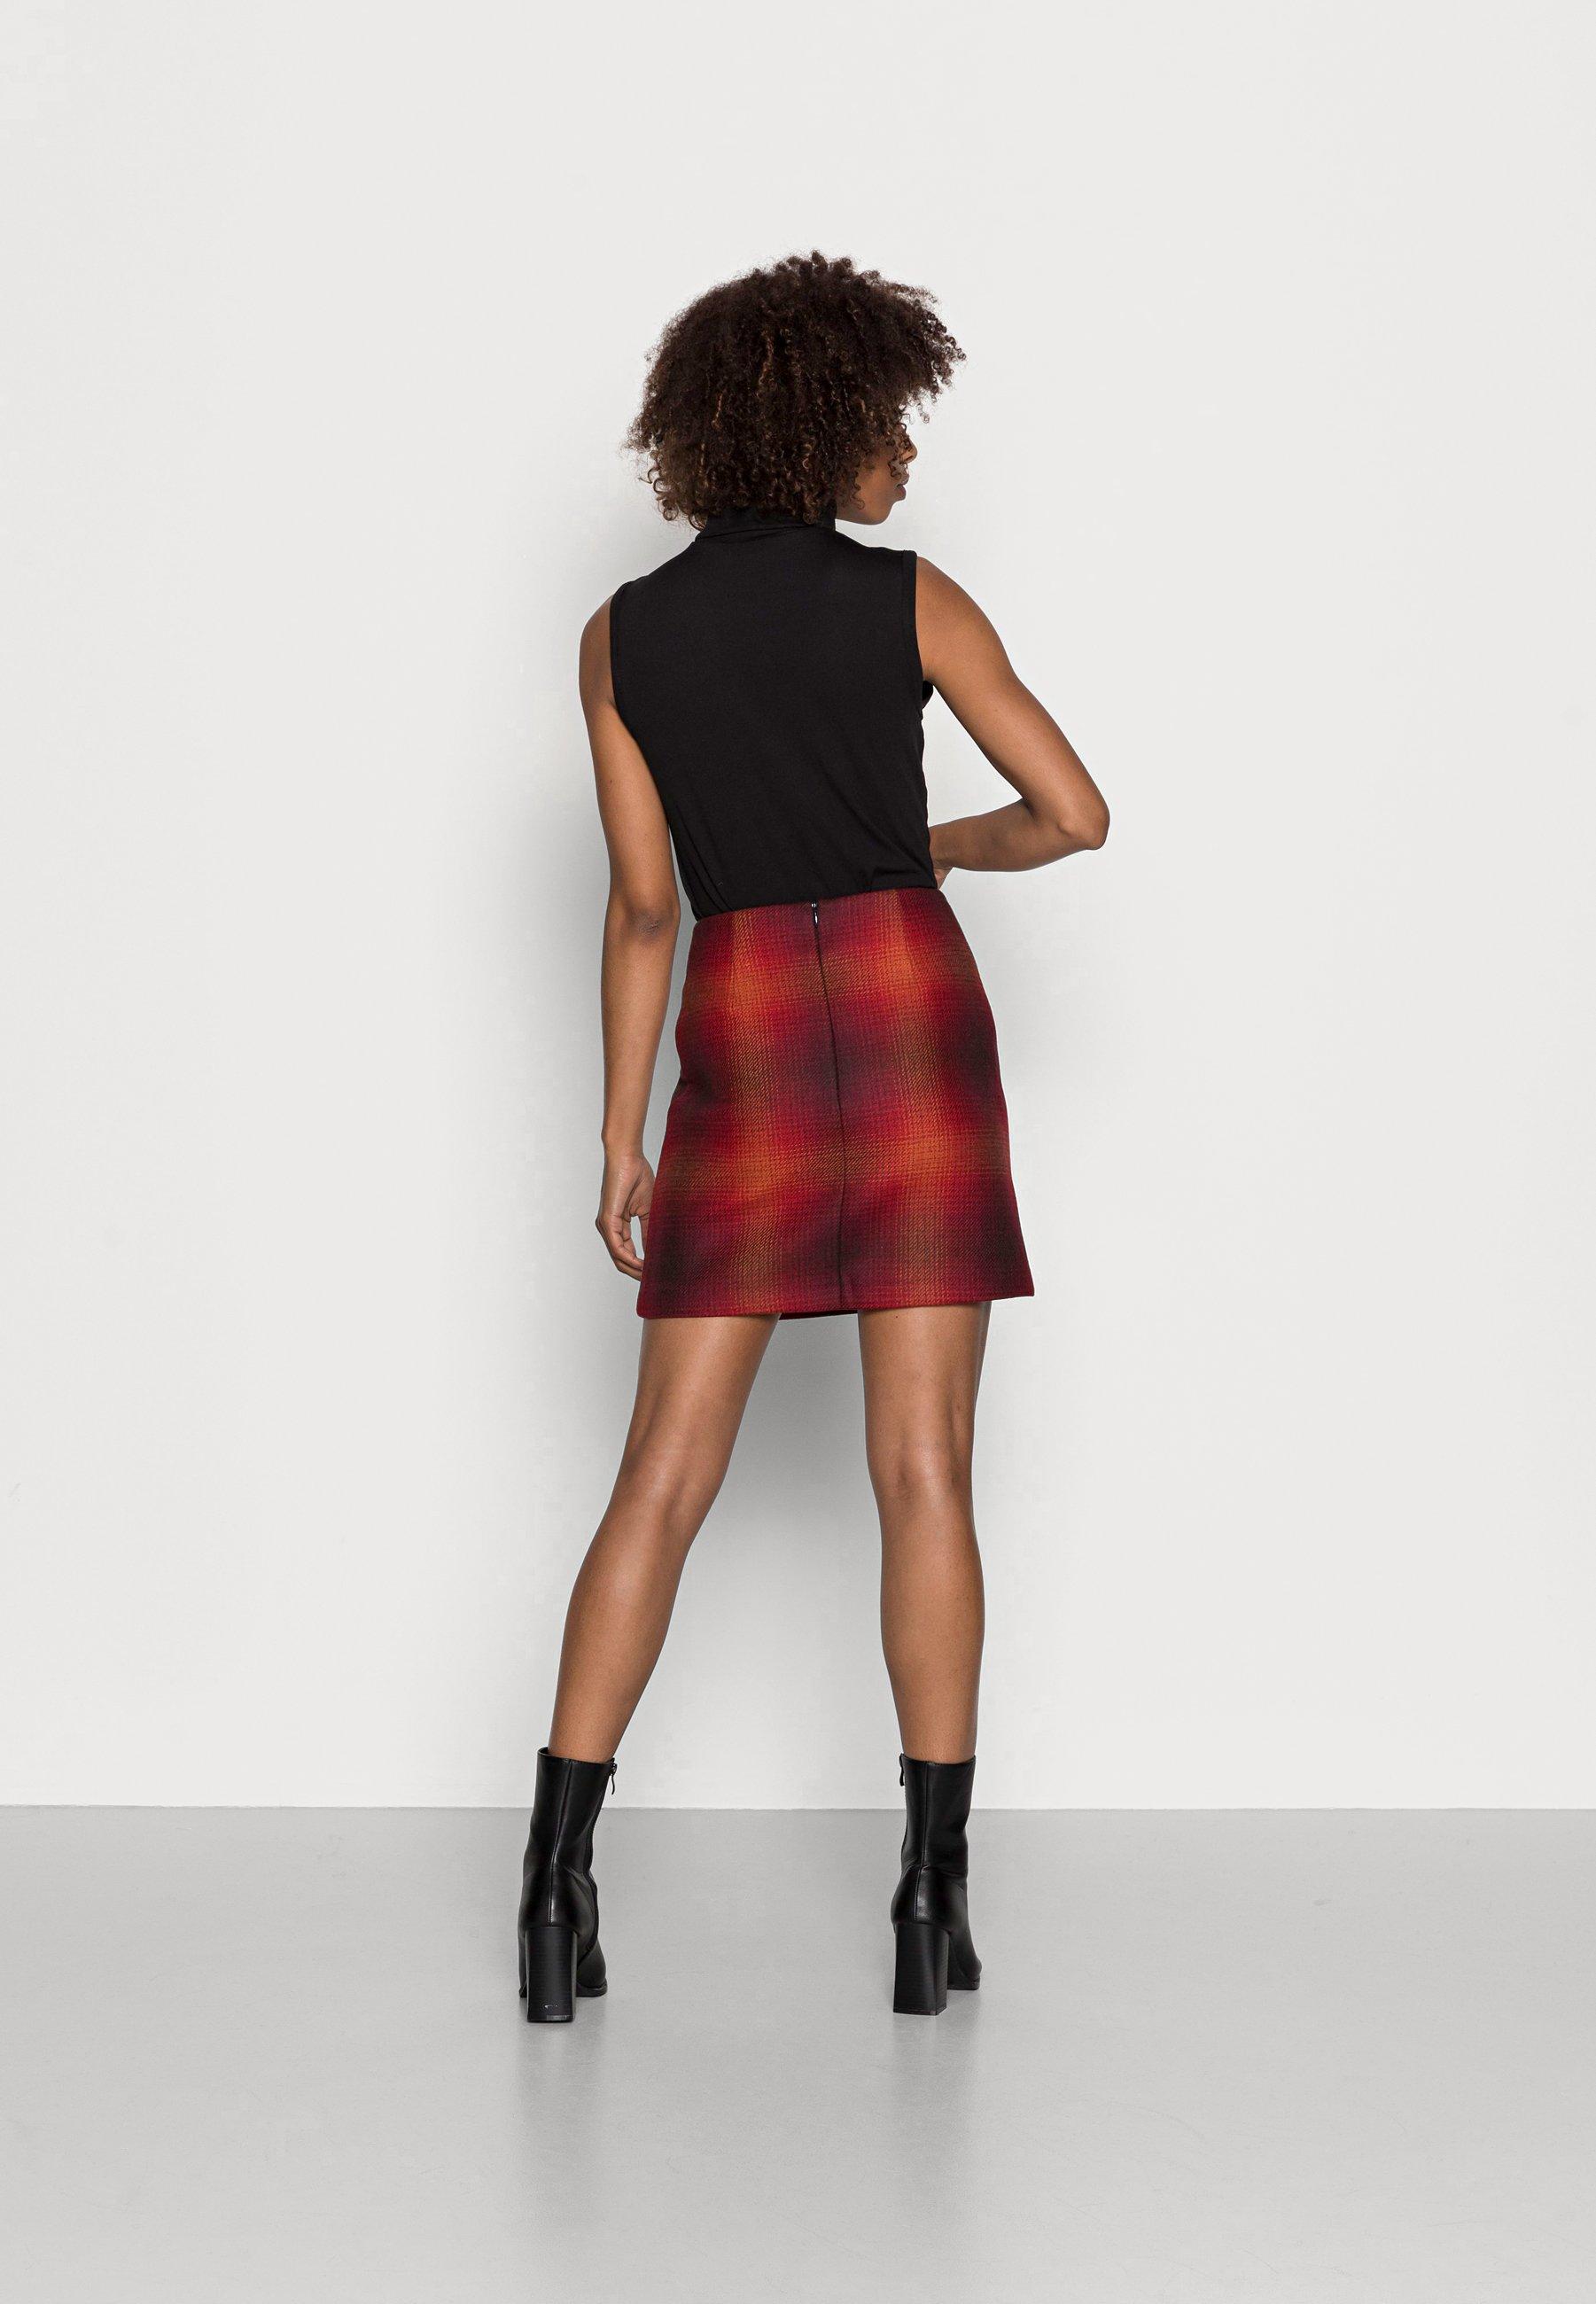 Femme SHADOW CHECK SKIRT - Minijupe